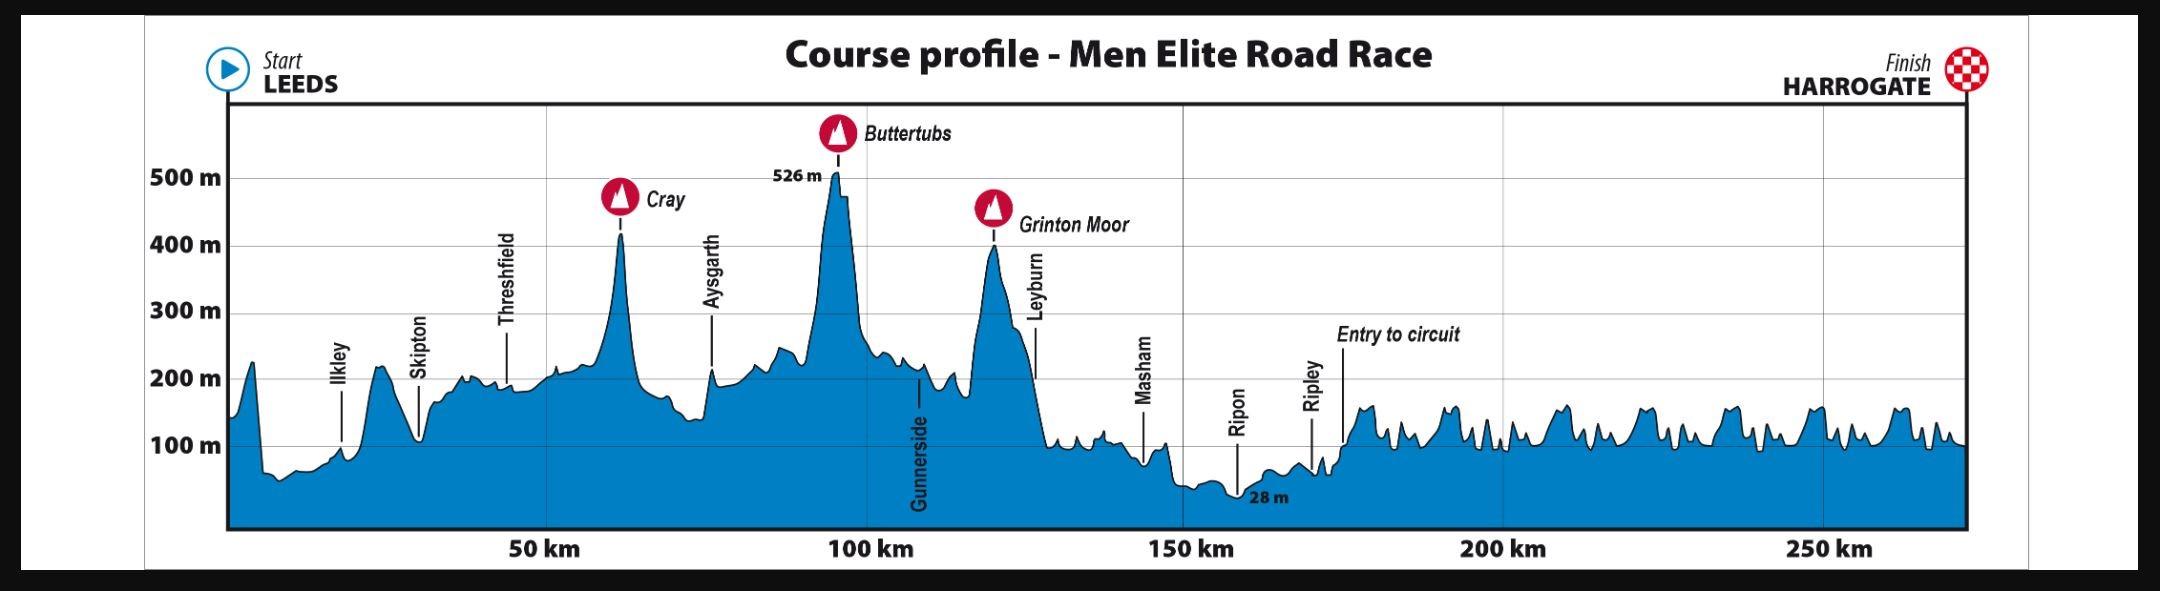 World championships 2019 men's road race profile